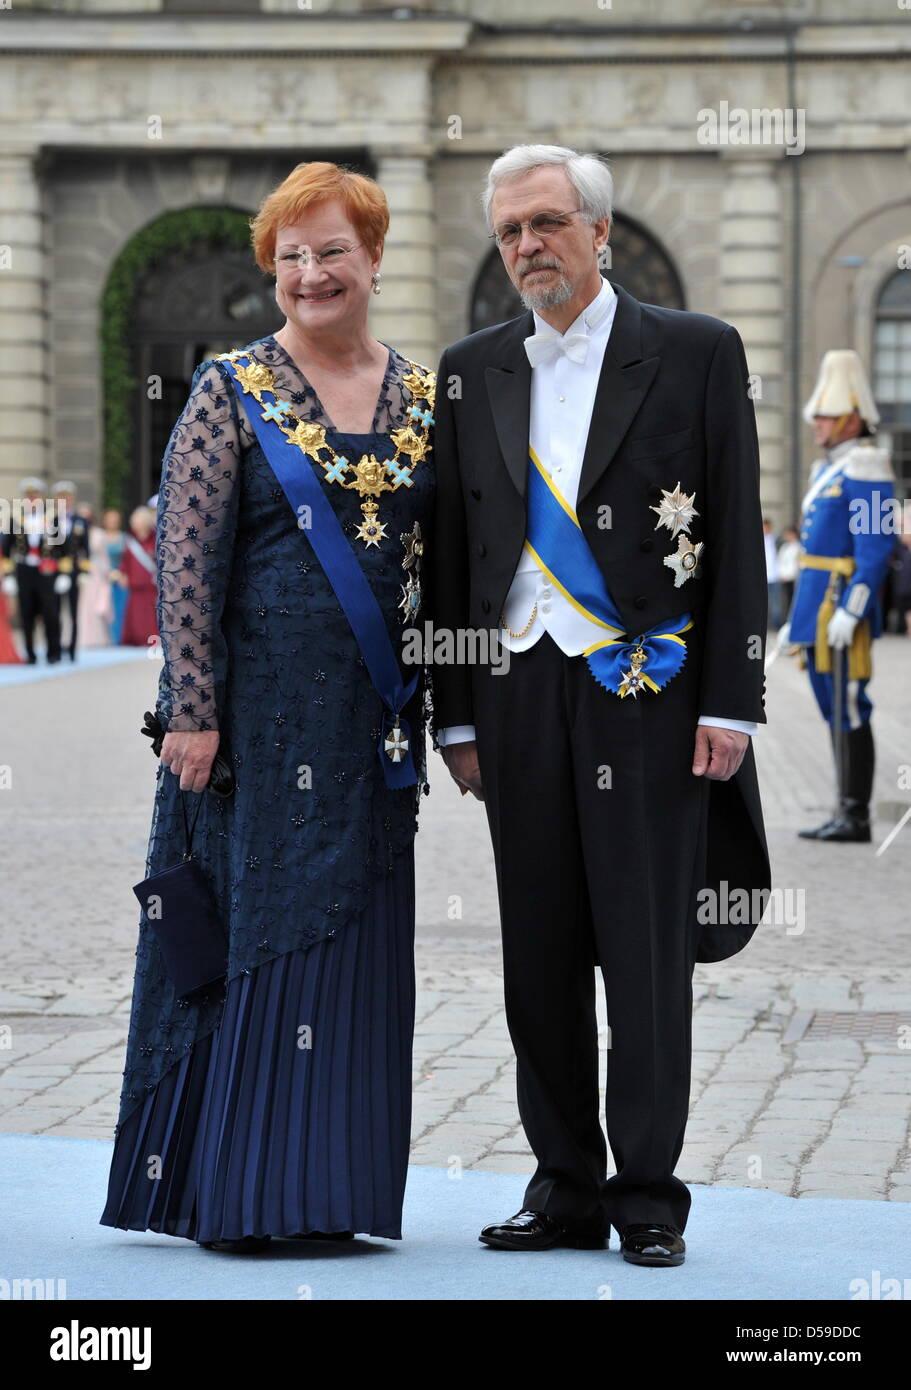 finlands president tarja halonen husband stock photos